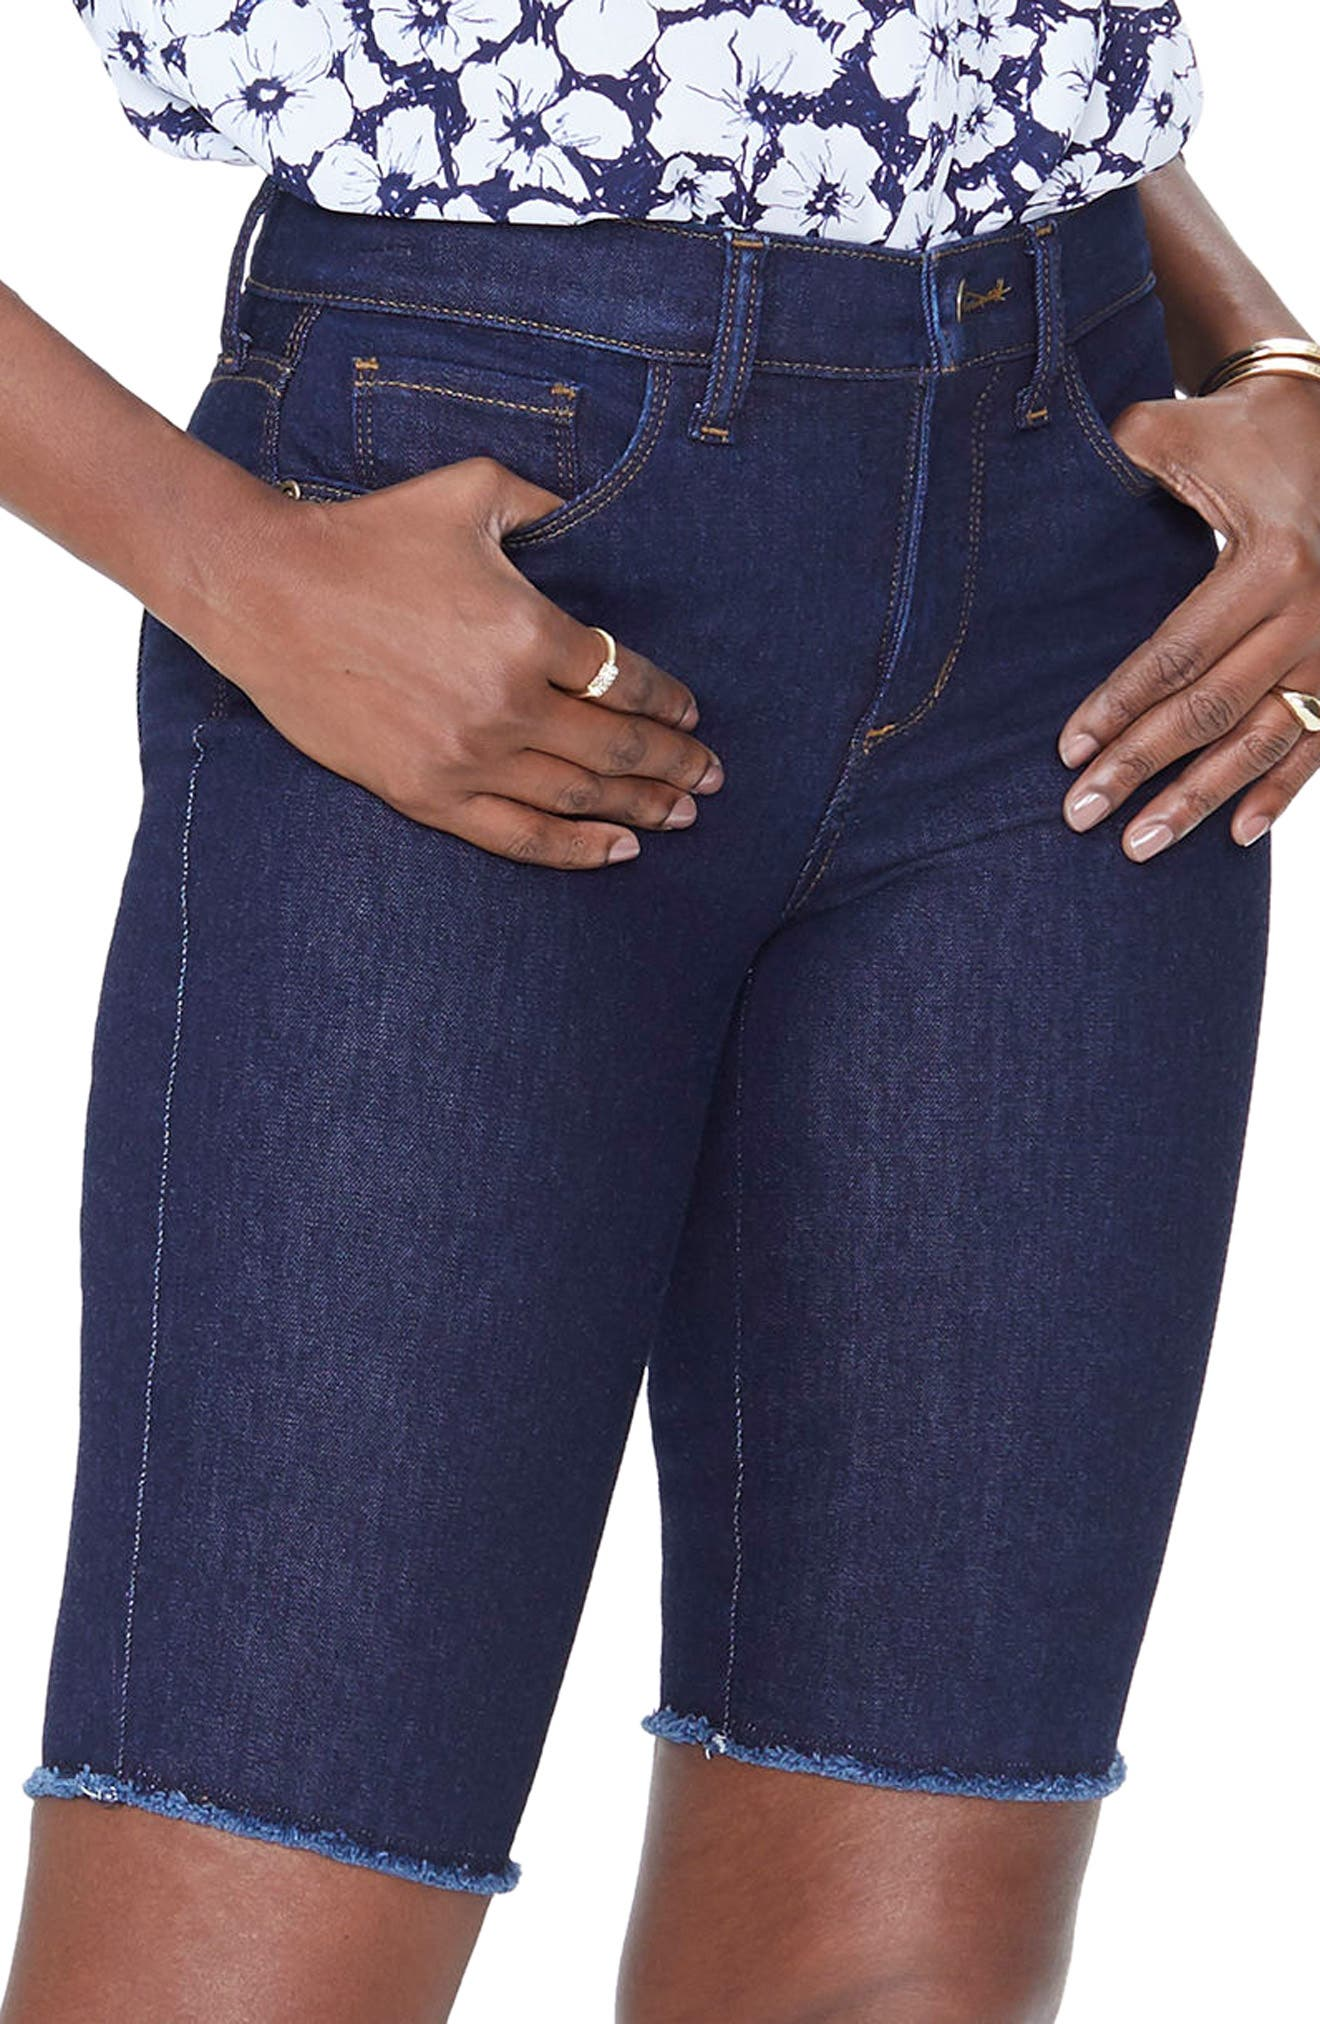 Image of NYDJ Briella Frayed Bermuda Denim Shorts